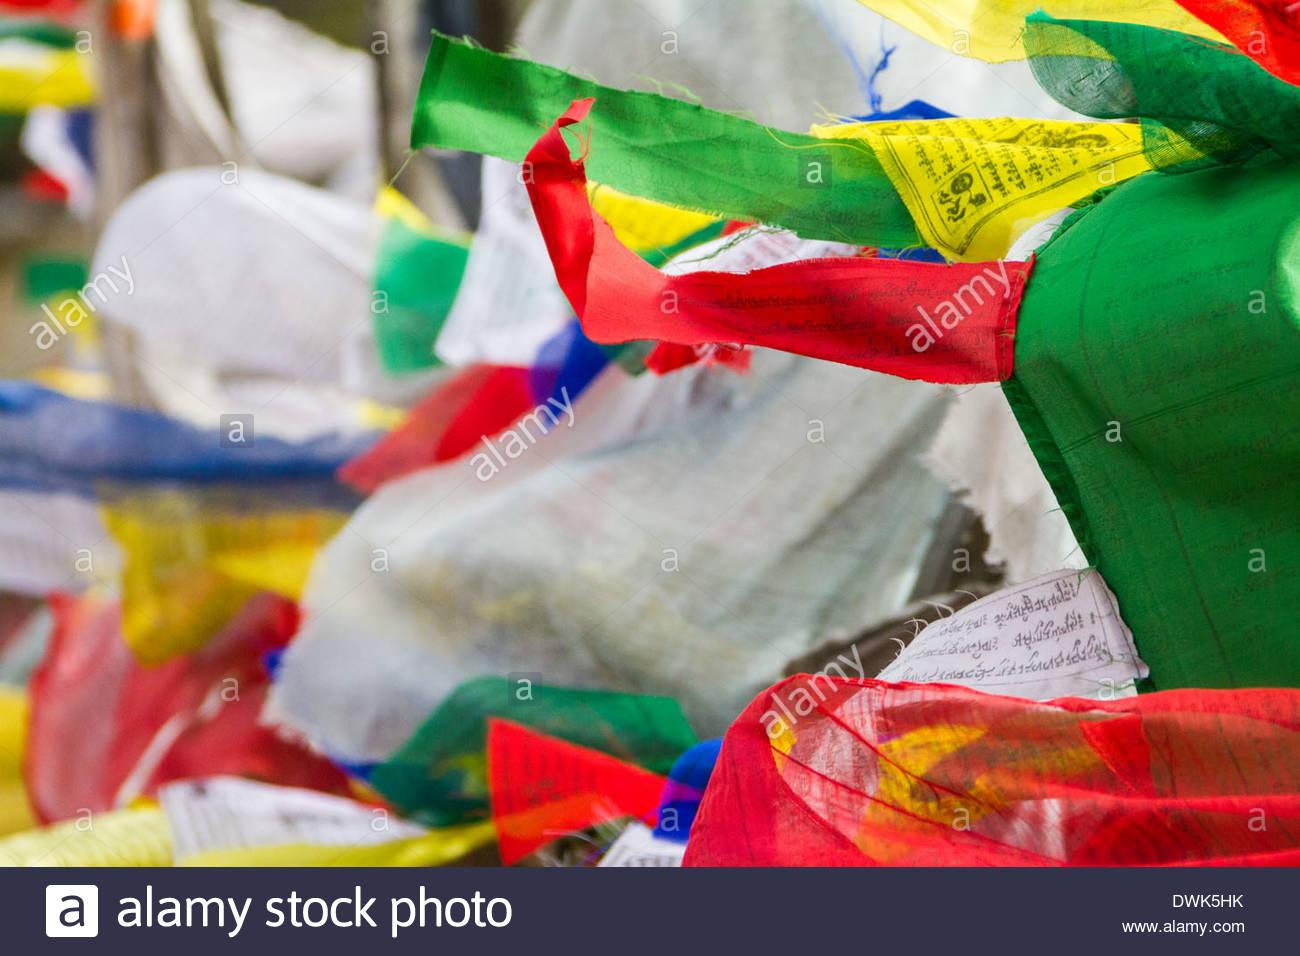 Prayer Flags Billow In The Wind, Bhutan - Stock Image